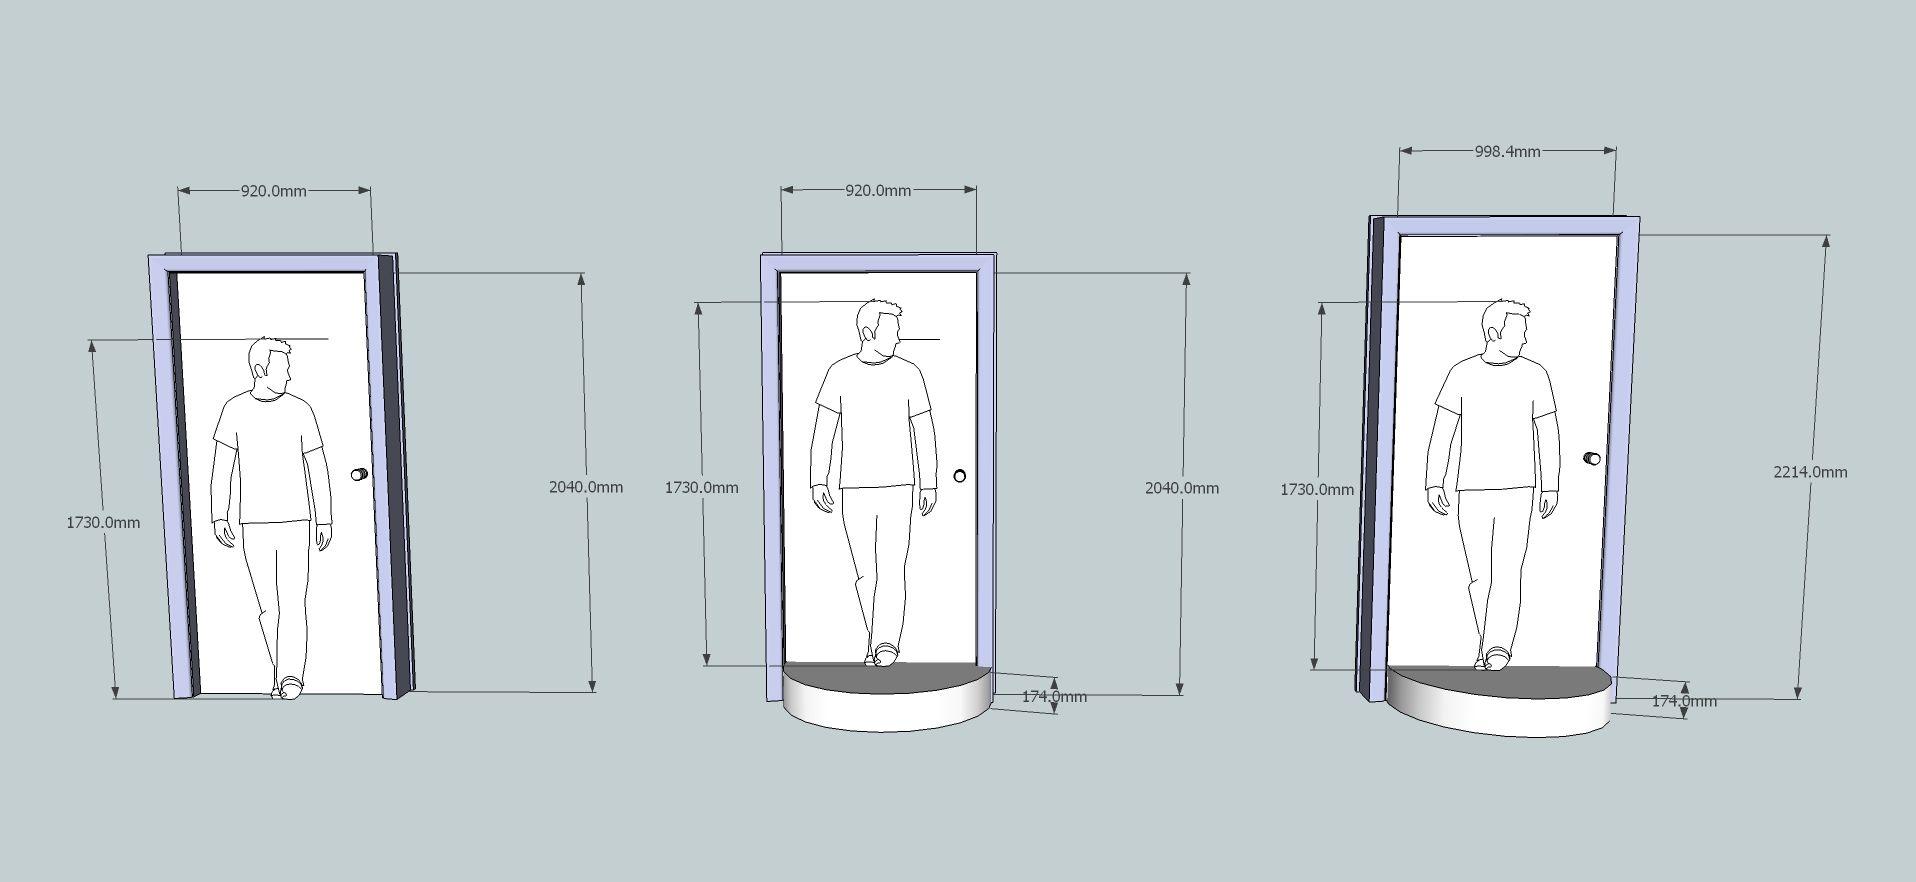 standard door sizes - Google Search | Fundamentals - la Biennale di ...